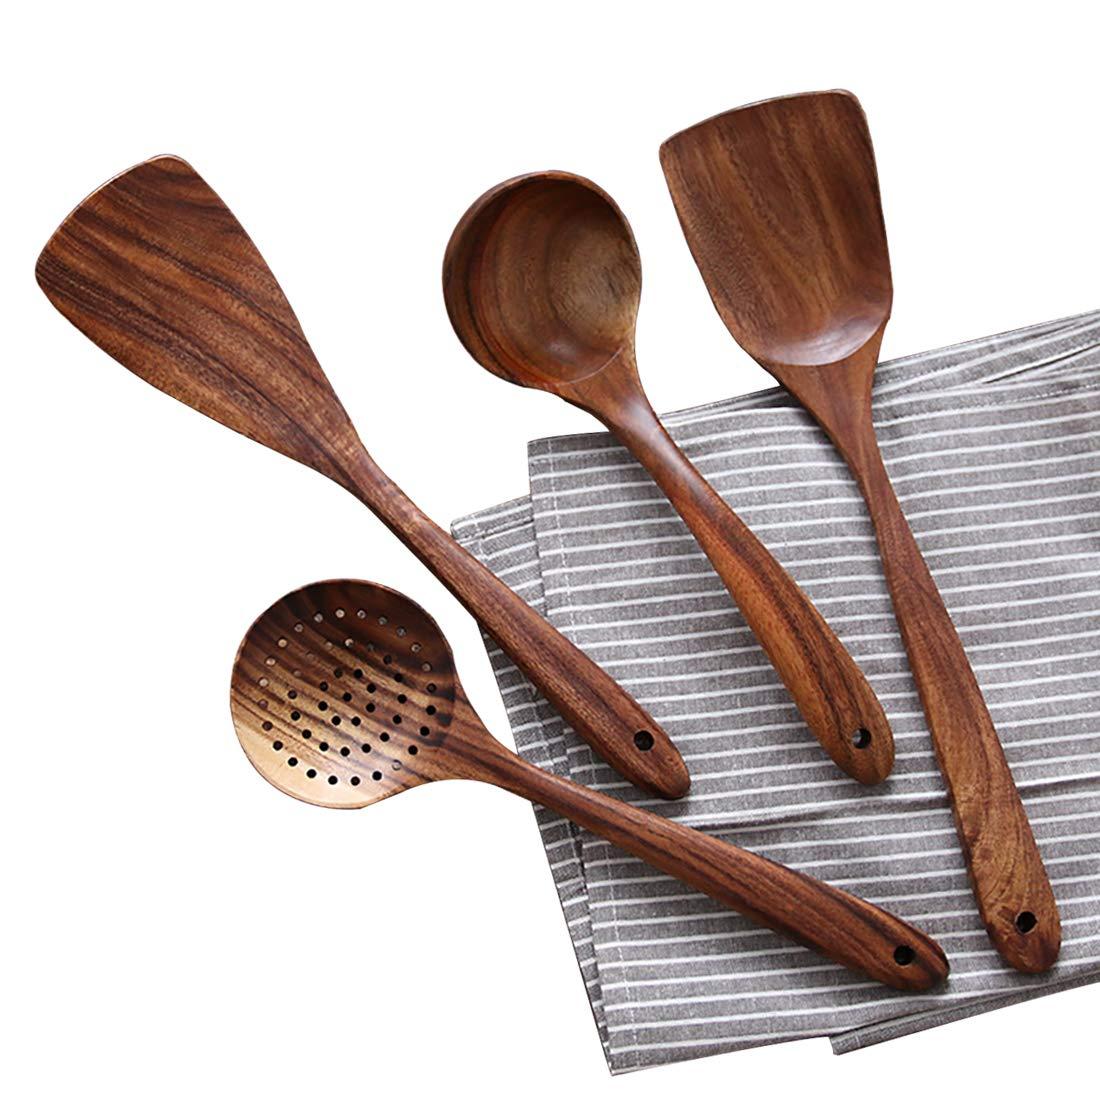 UBae Teak 4 Piece Set Kitchen Utensils Wooden Kitchenware Set Nonstick Pan Cookware Natural and Eco-Friendly Kitchen Utensils Set